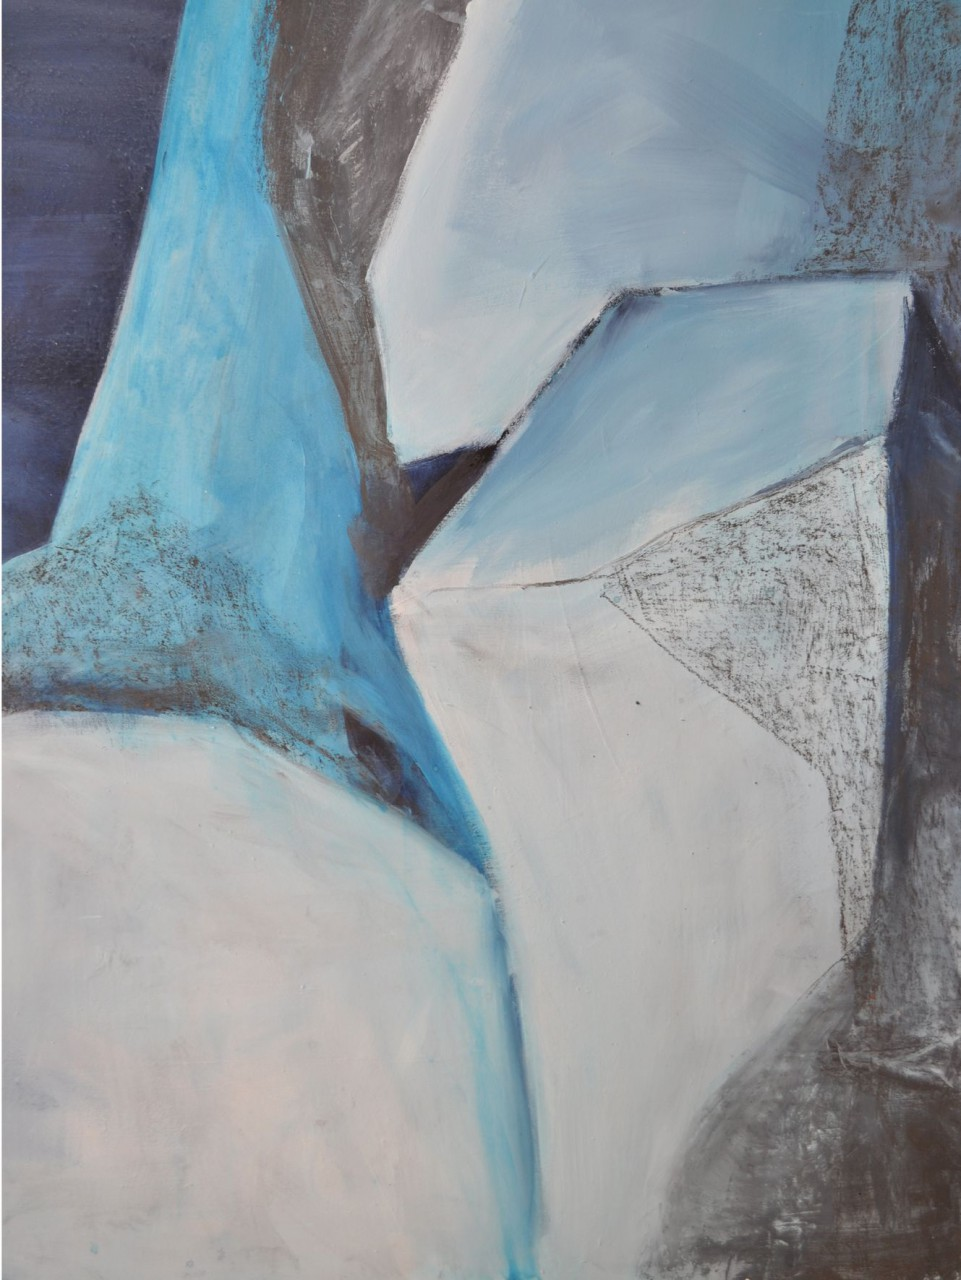 moreno gletscher 6